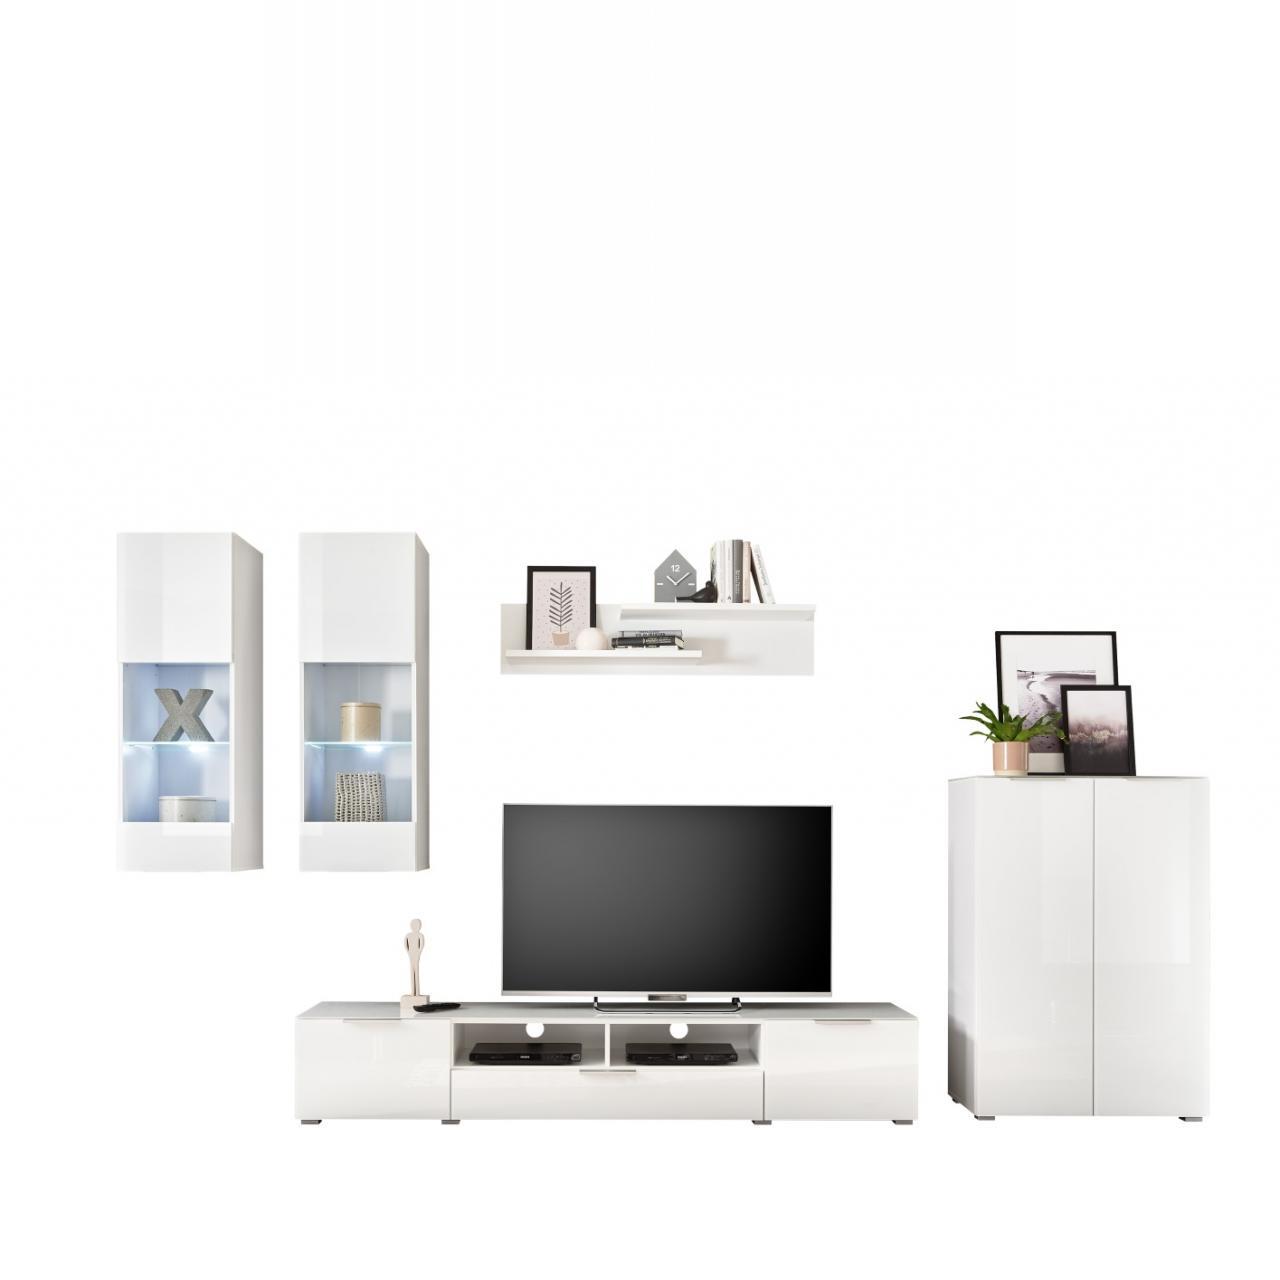 Anbauwand Marseille Opti-Weiß Weiß Lackiert inkl. Beleuchtung 5-teilig Wohnwand